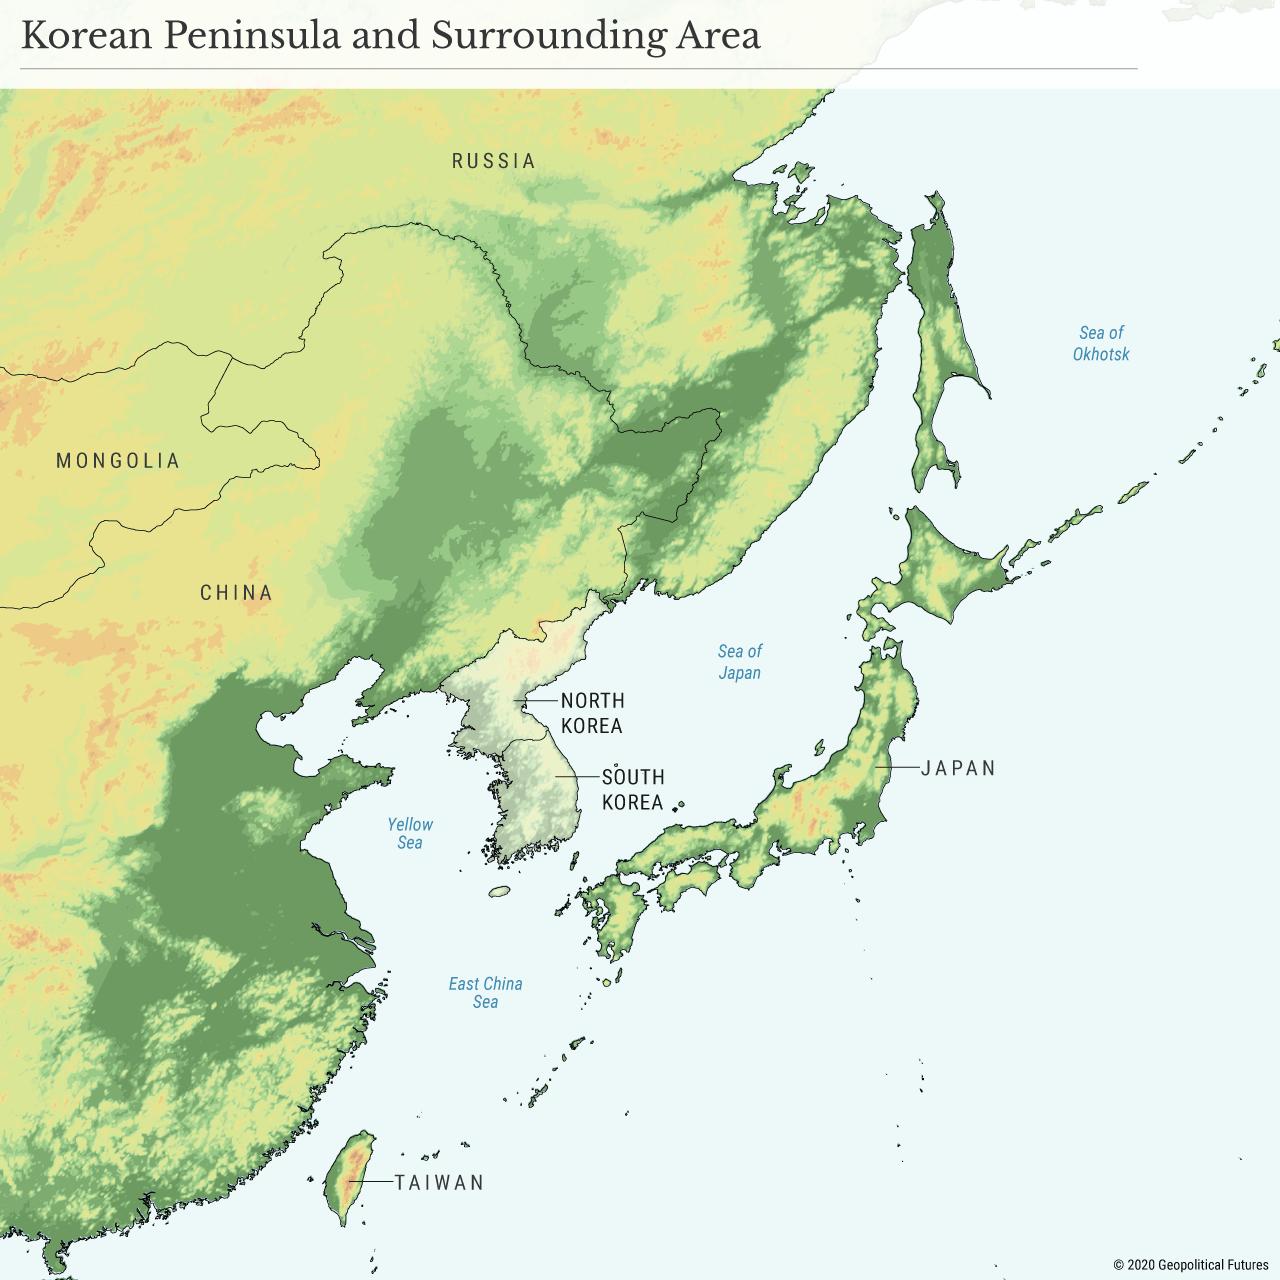 Korean Peninsula and Surrounding Area